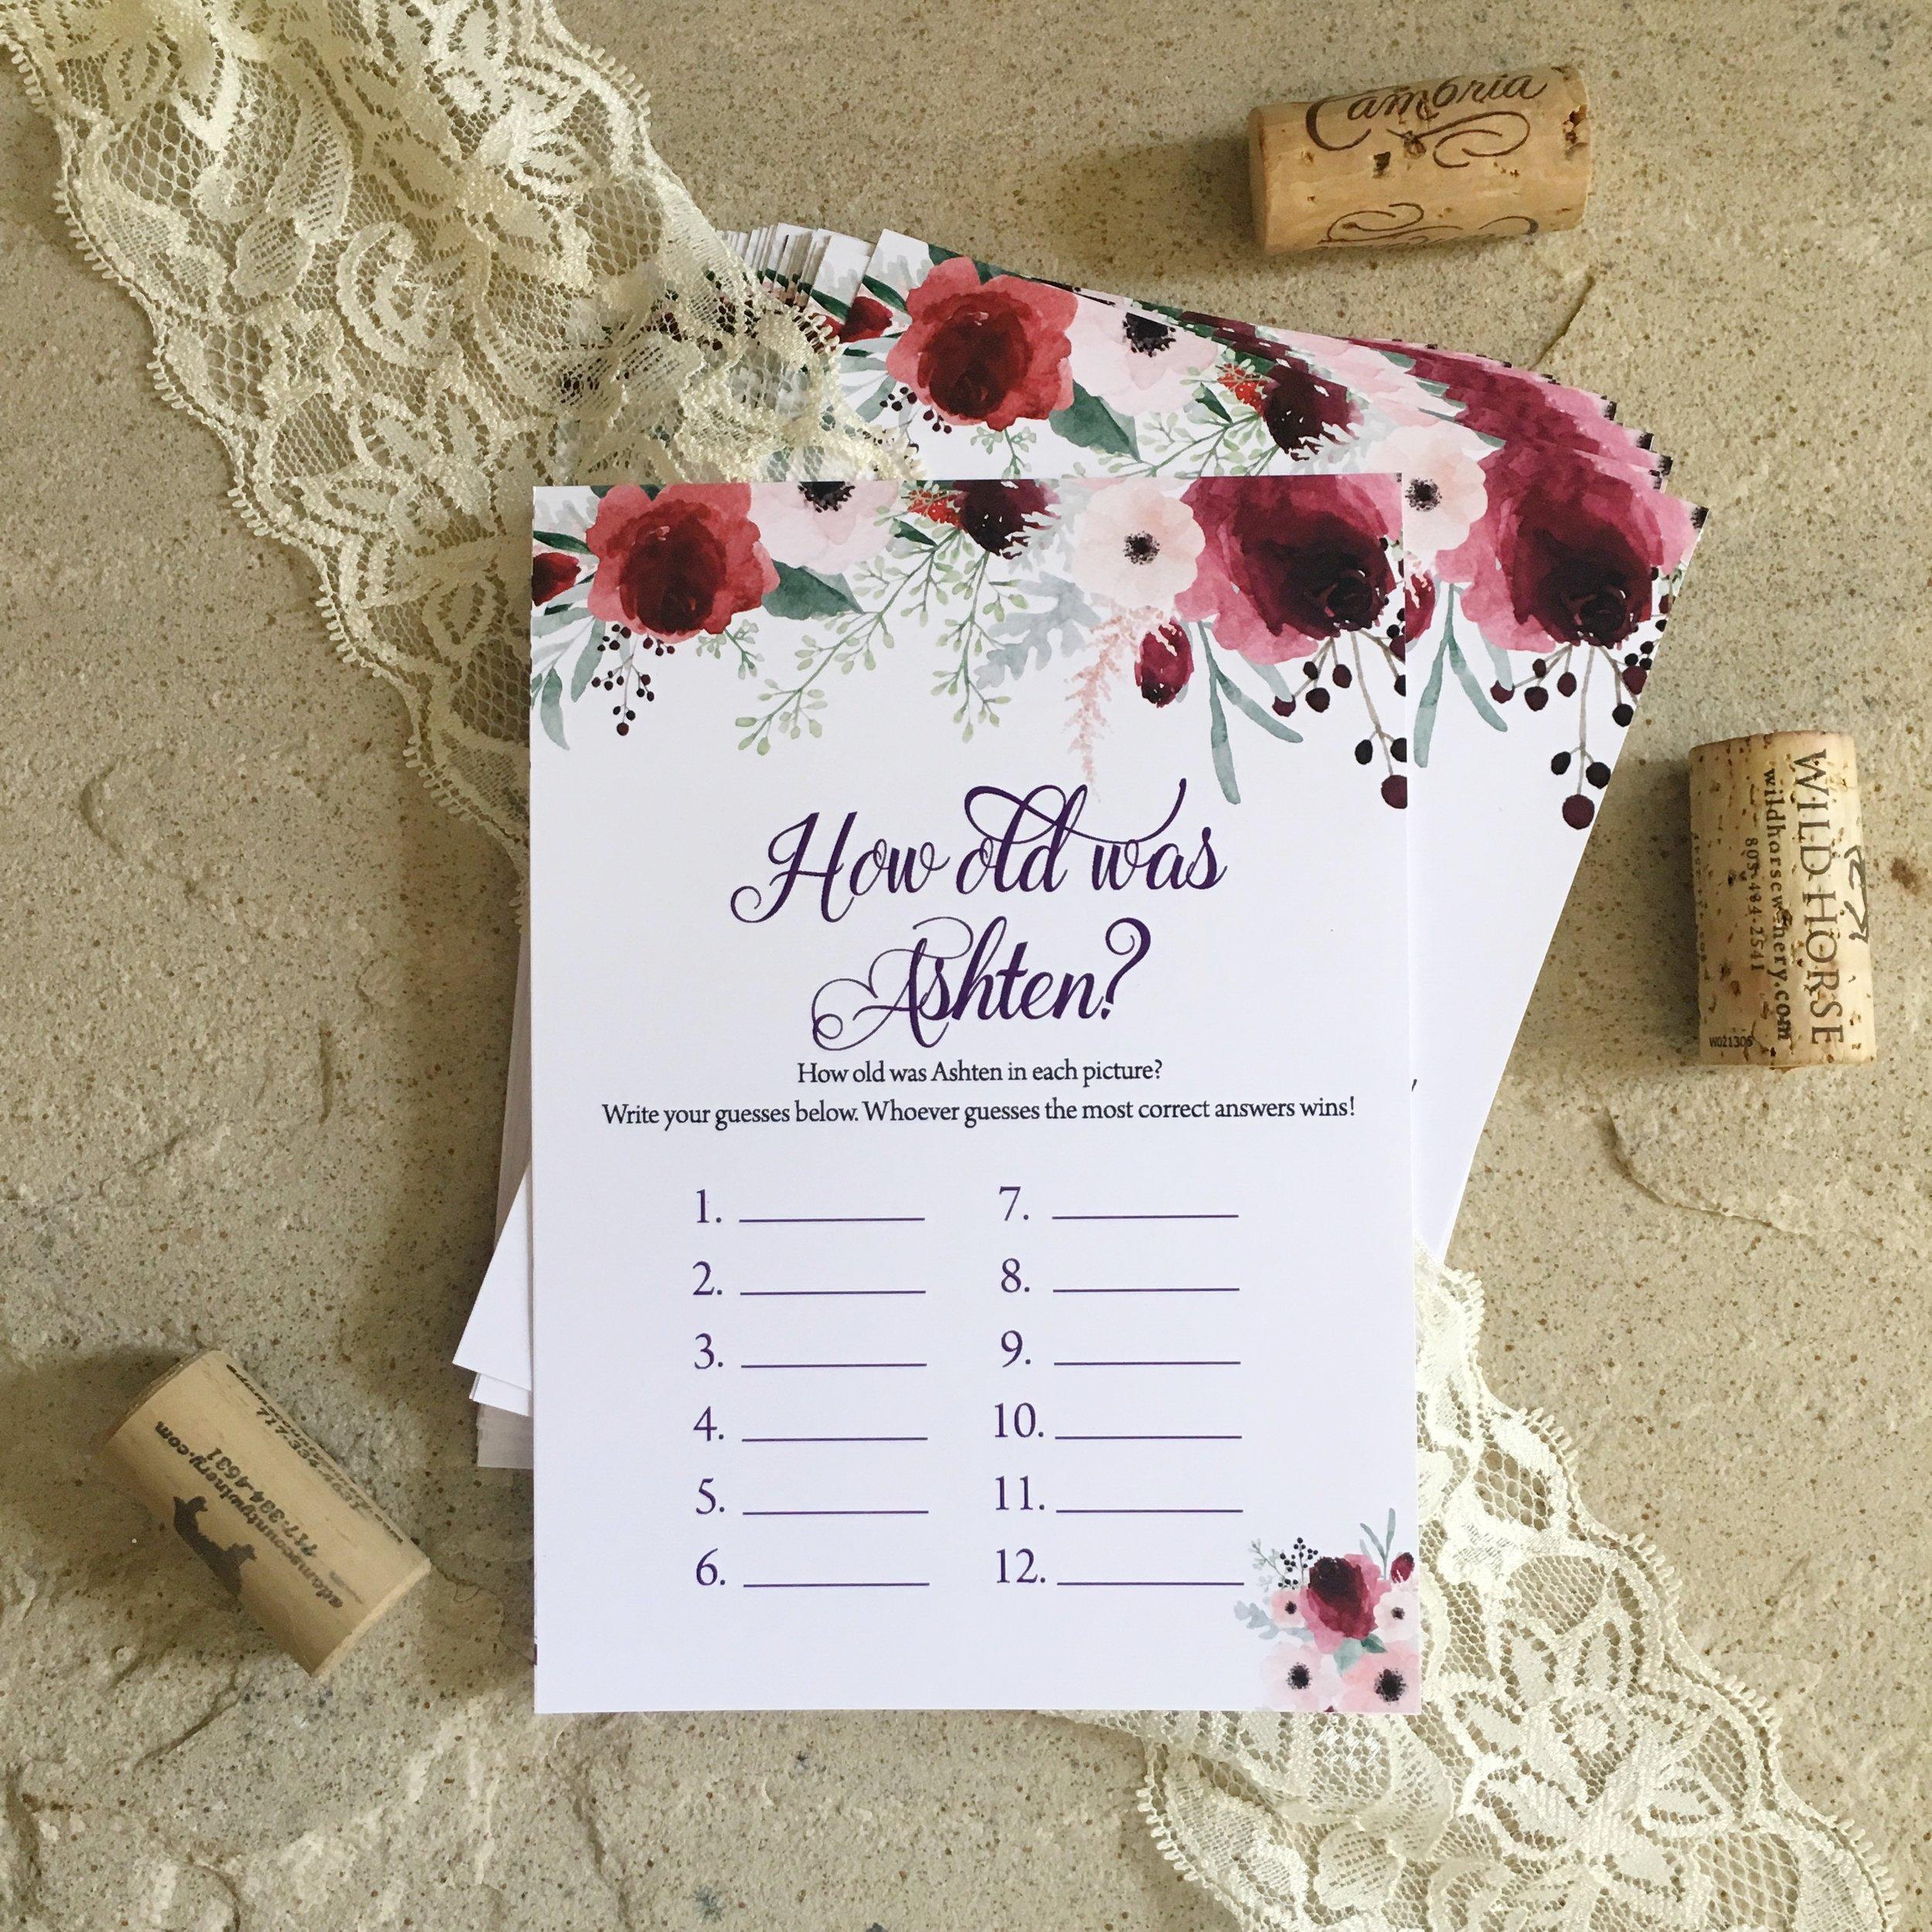 Central PA, York PA, JesSmith Designs, custom, wedding, invitations, bridal, announcements, save the date, birth, baby, motherhood, hanover, calligraphy, handlettering-06-06 13.37.14.jpg